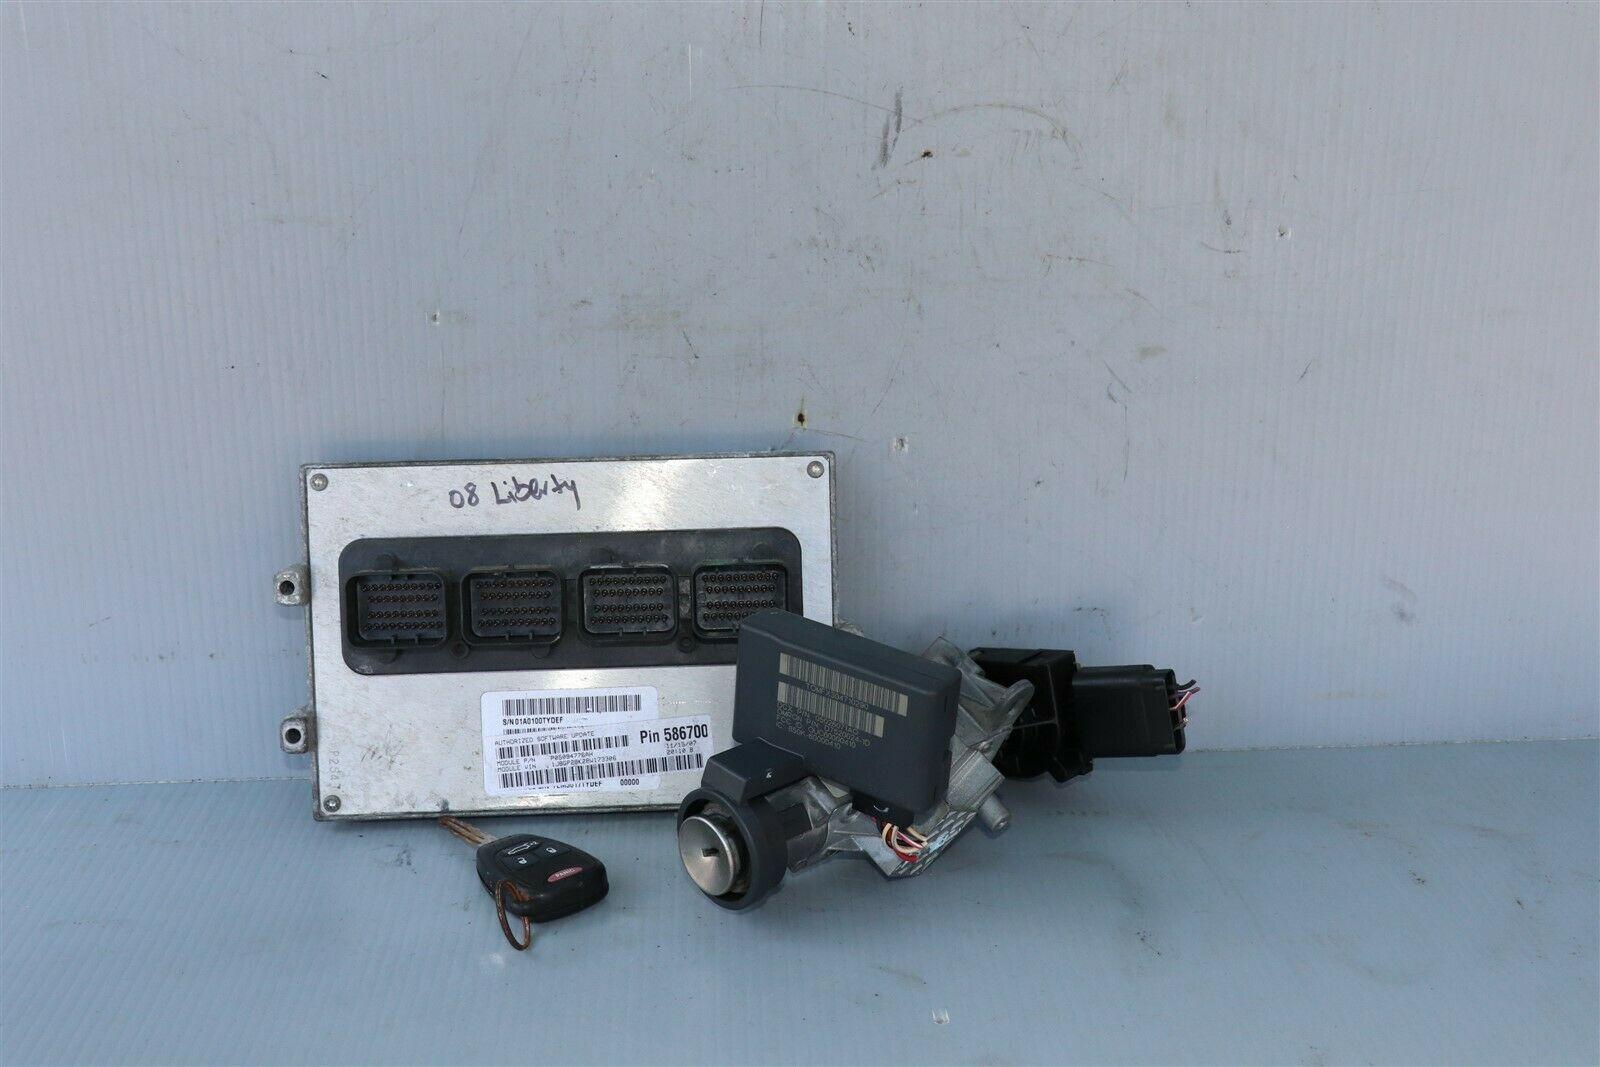 08 Jeep Liberty 3.7L 4x2 AT ECM ECU Ignition Switch Key Immobilizer P05094776AH